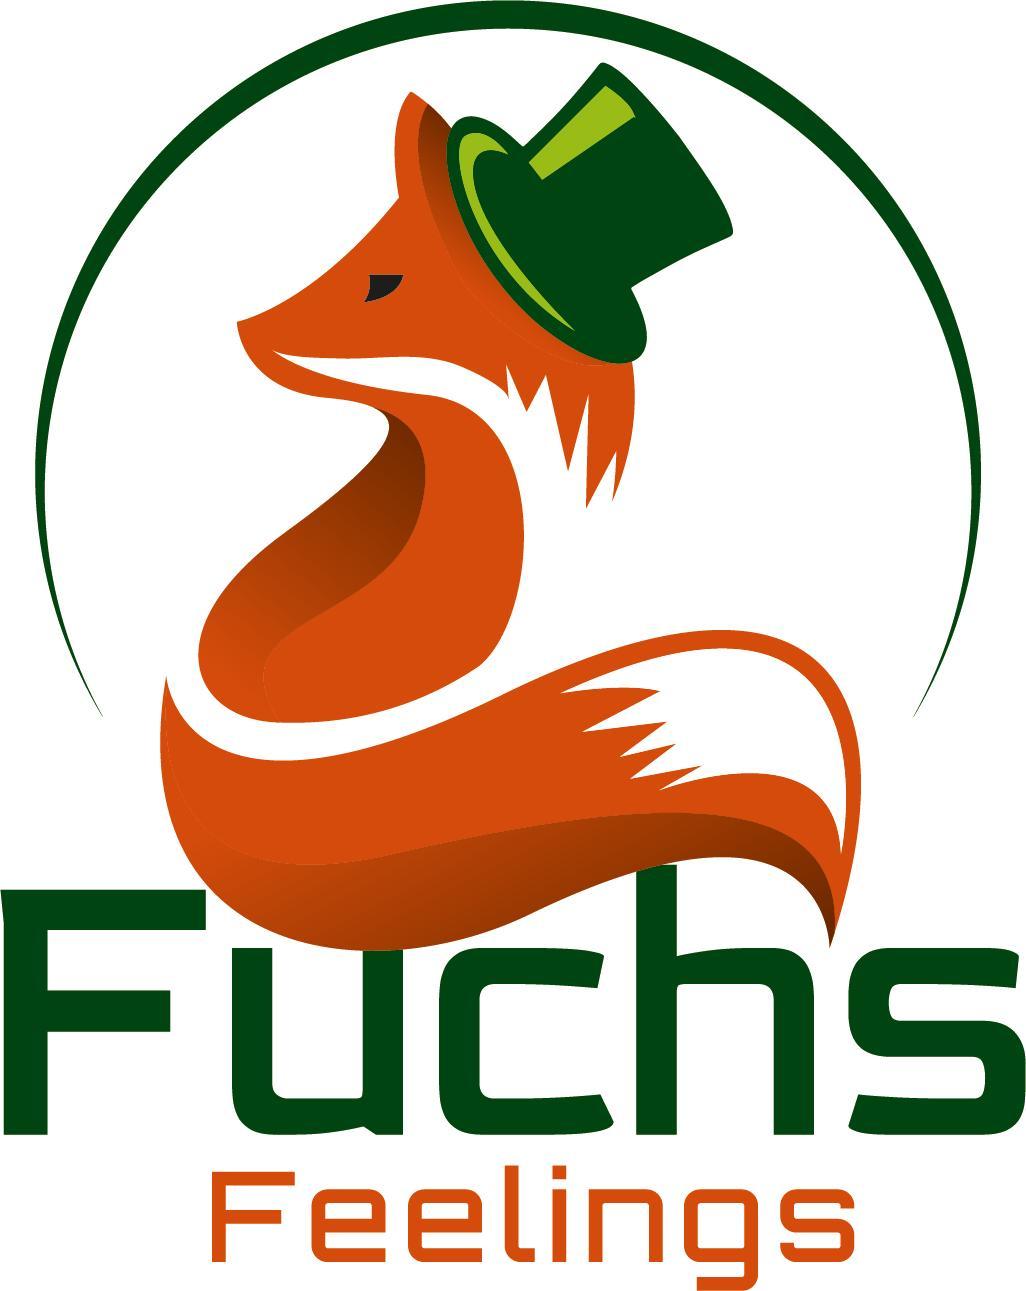 Wort-/Bildmarke: Fuchs Feelings